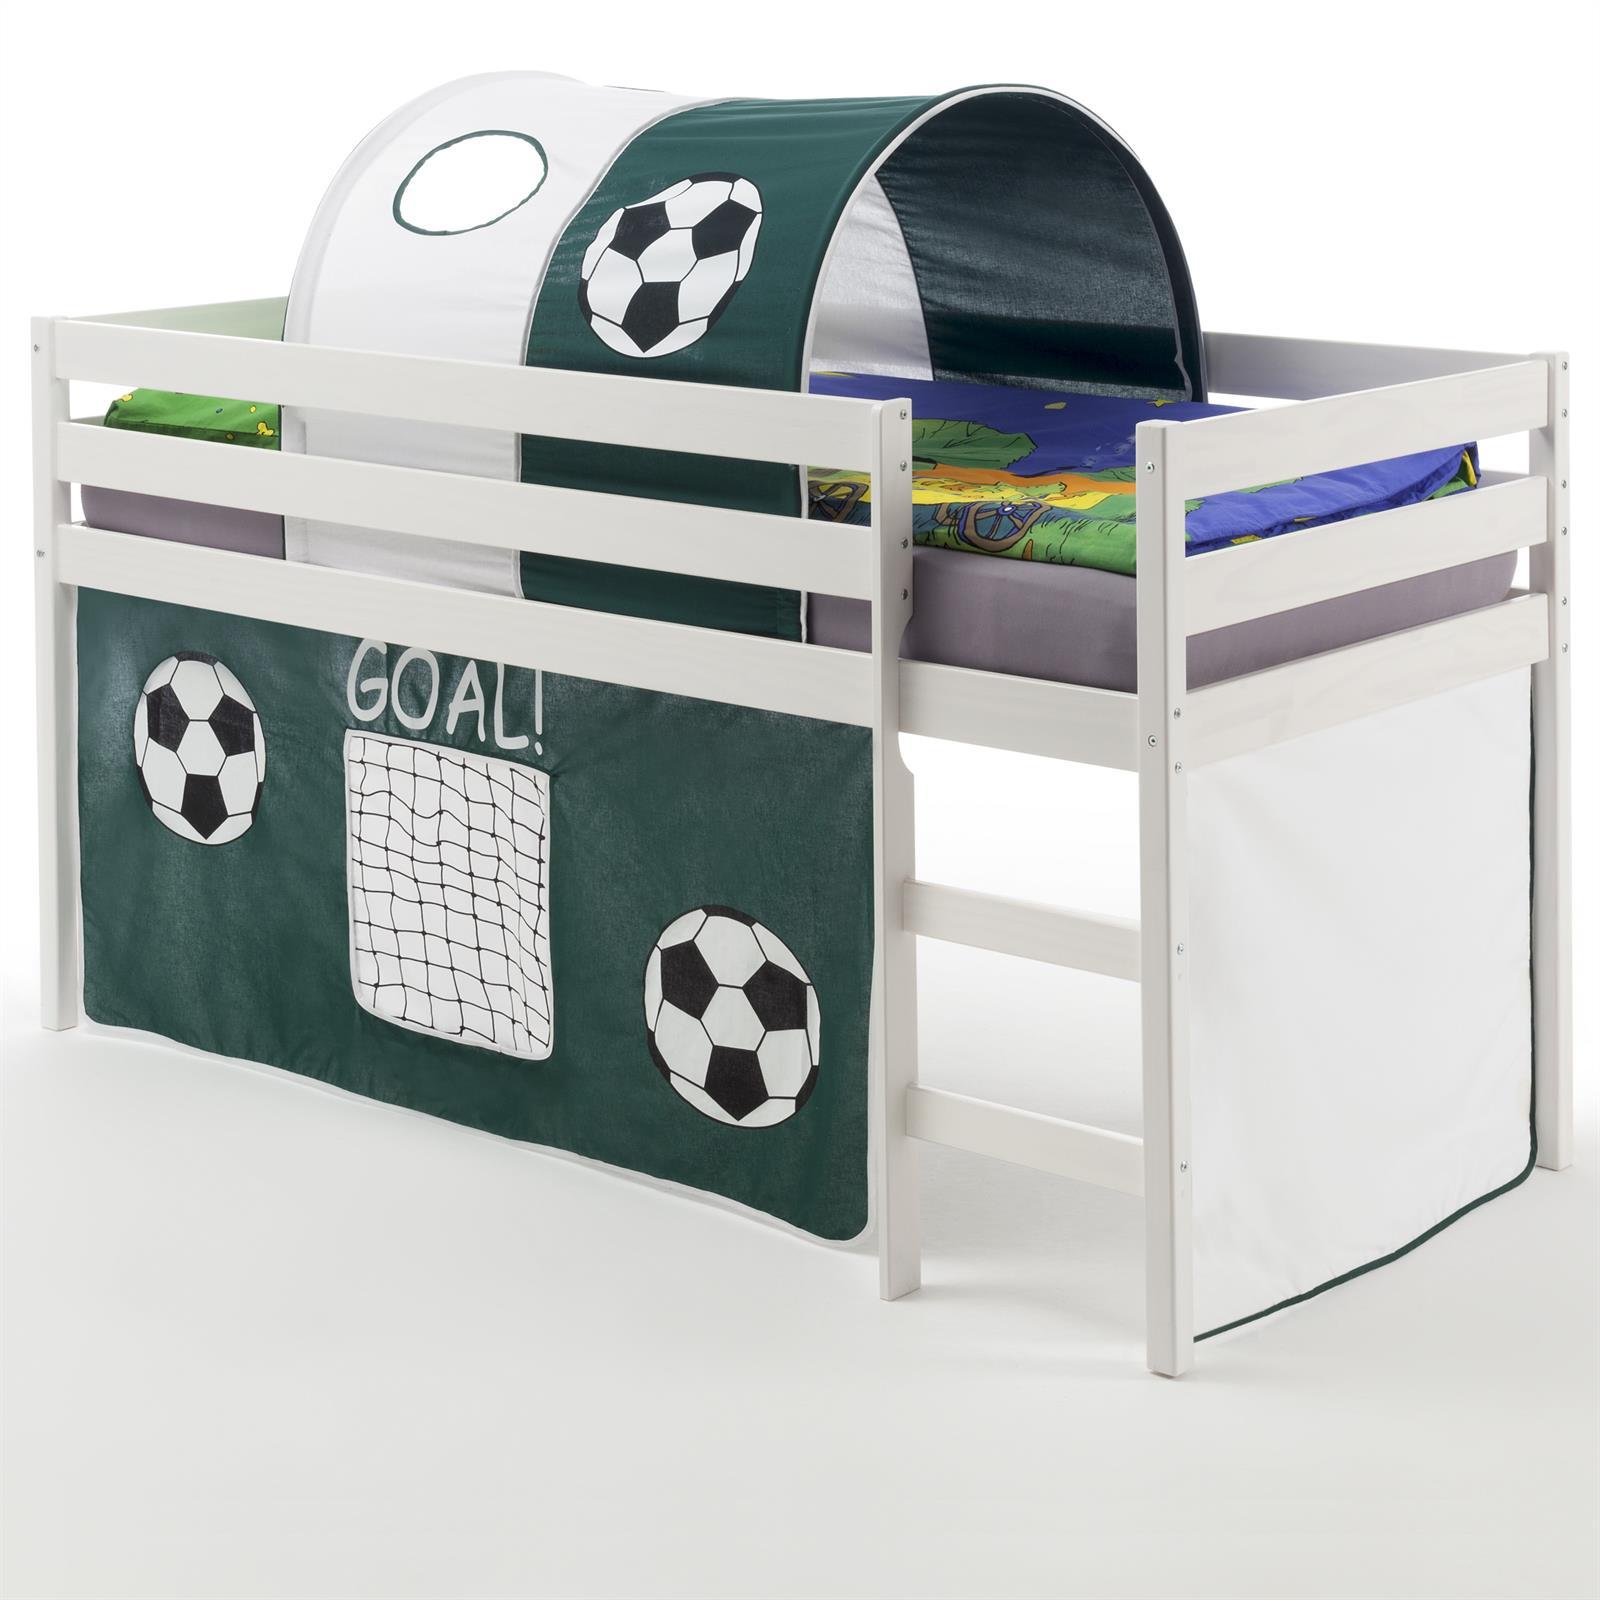 hochbett erik vorhang tunnel fussball mobilia24. Black Bedroom Furniture Sets. Home Design Ideas